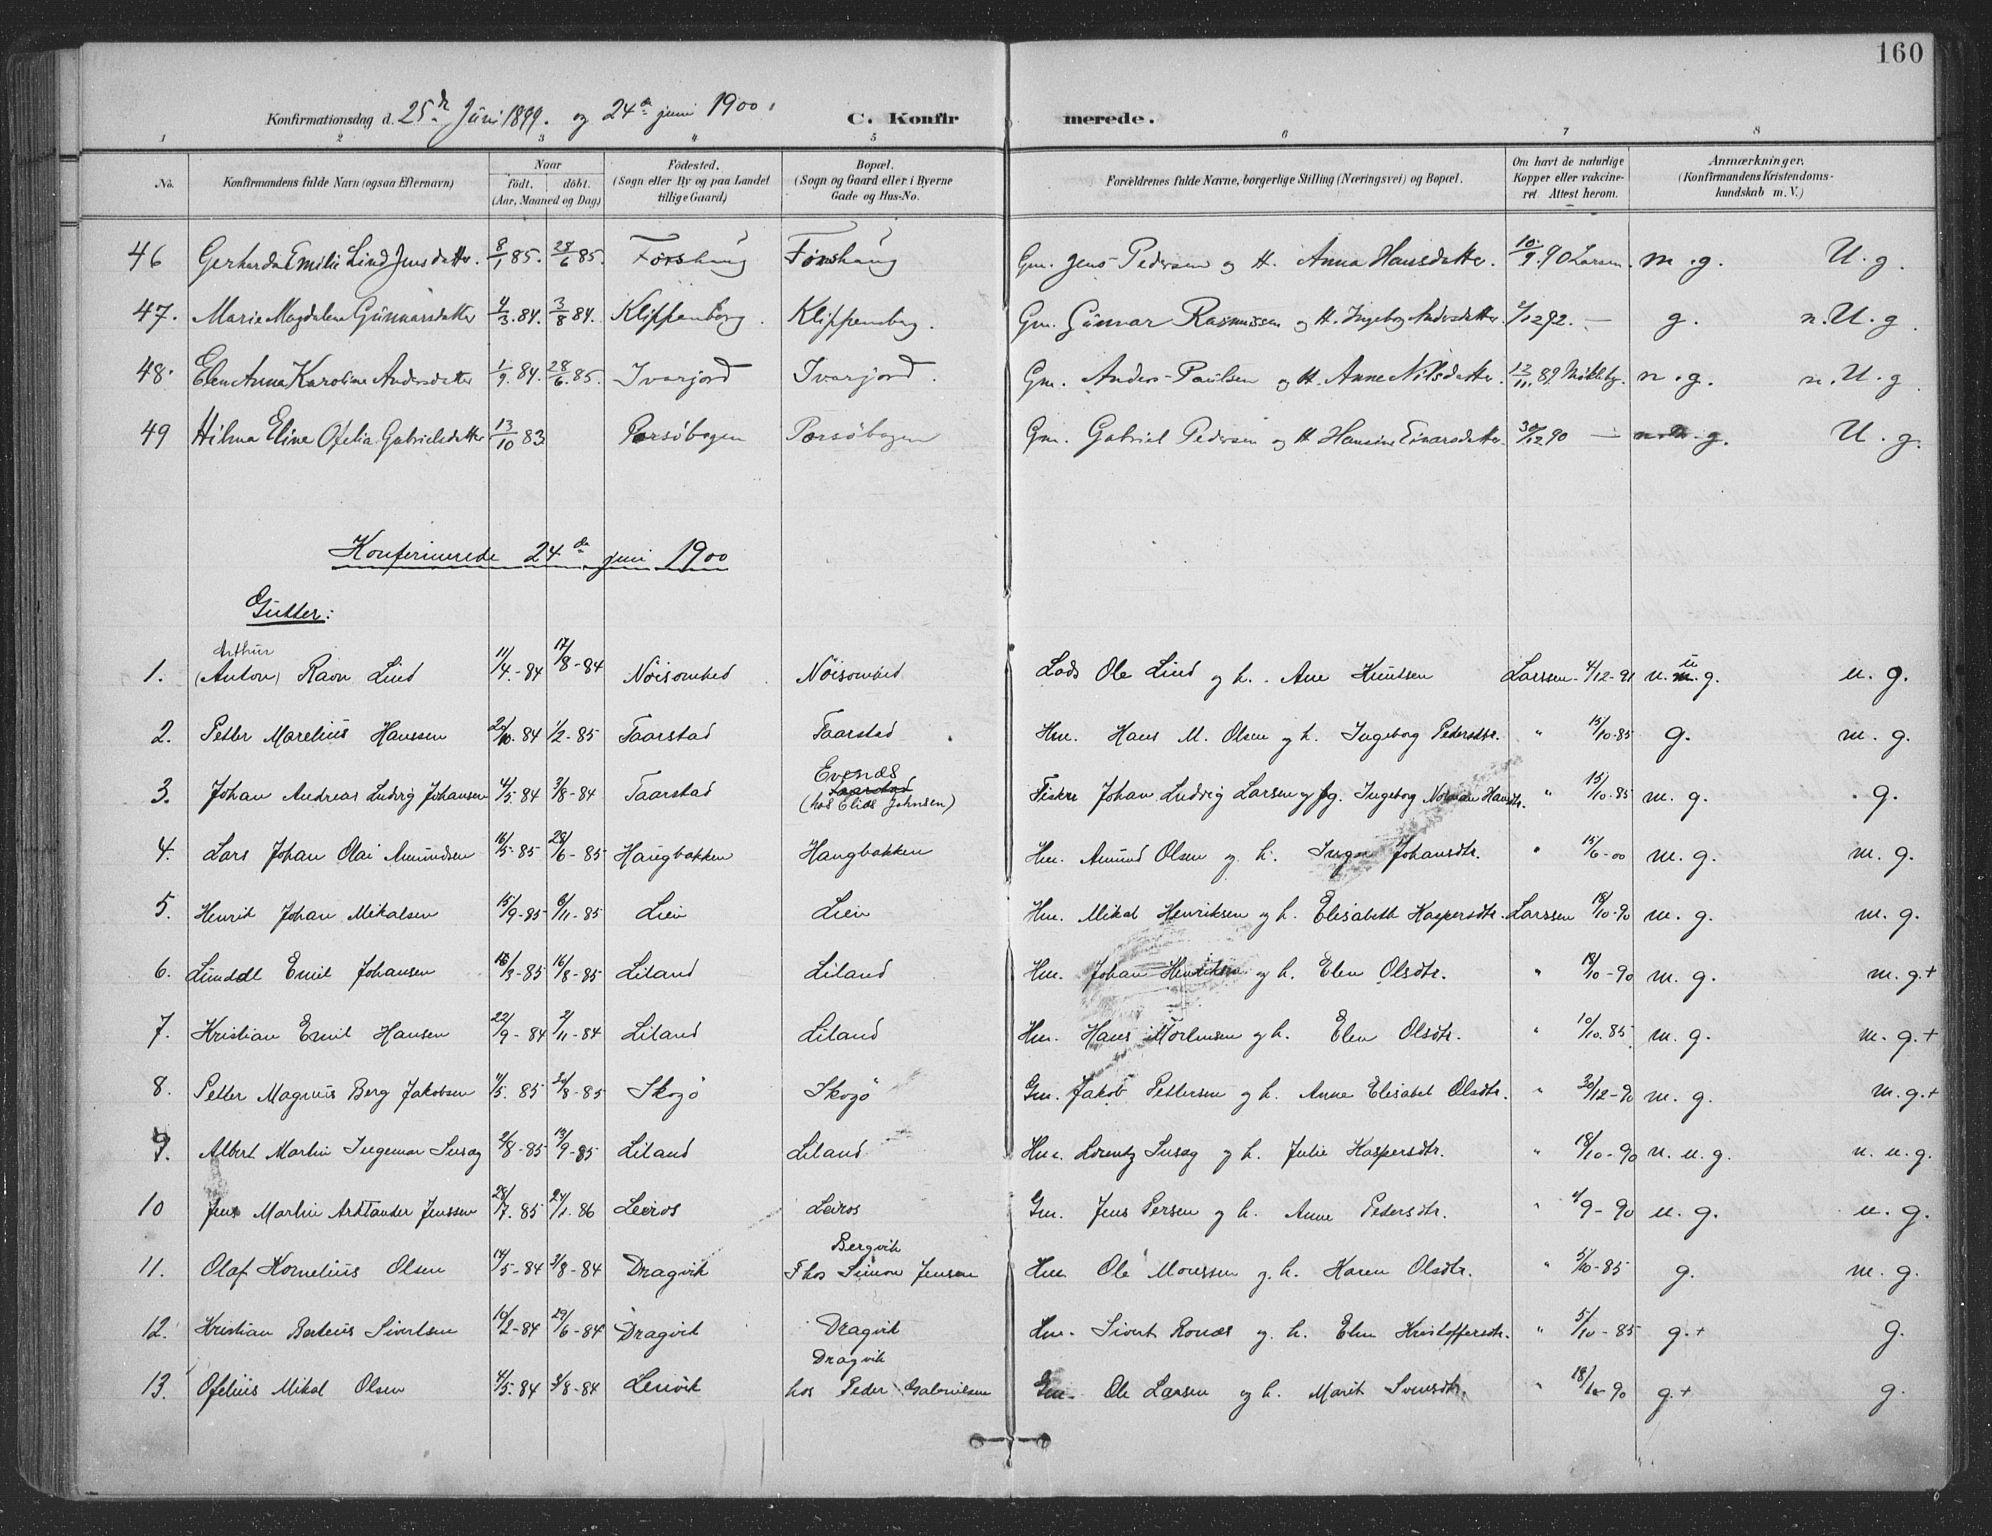 SAT, Ministerialprotokoller, klokkerbøker og fødselsregistre - Nordland, 863/L0899: Ministerialbok nr. 863A11, 1897-1906, s. 160